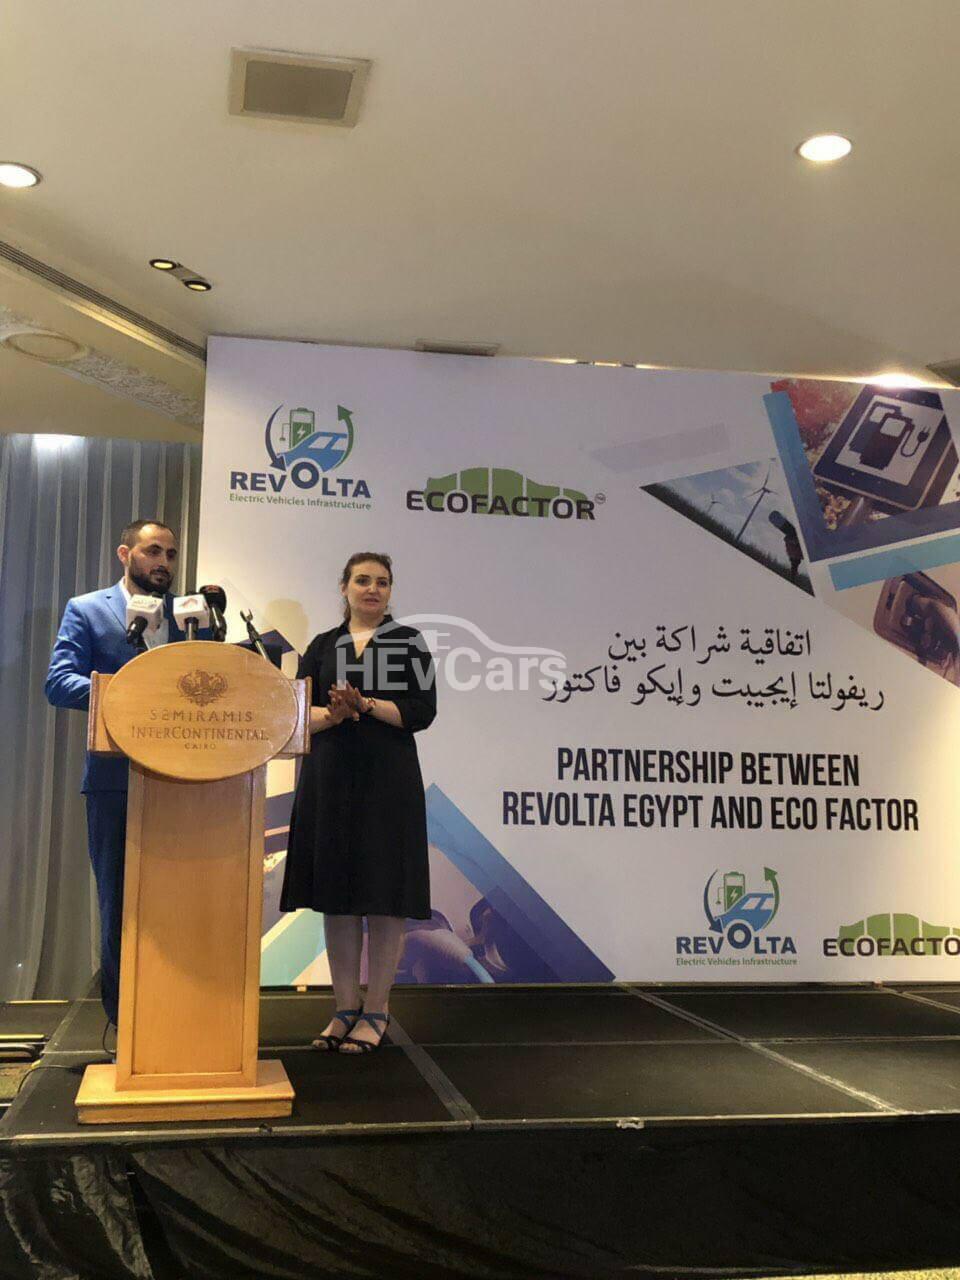 Revolta Egypt объявил о сотрудничестве с компанией EcoFactor